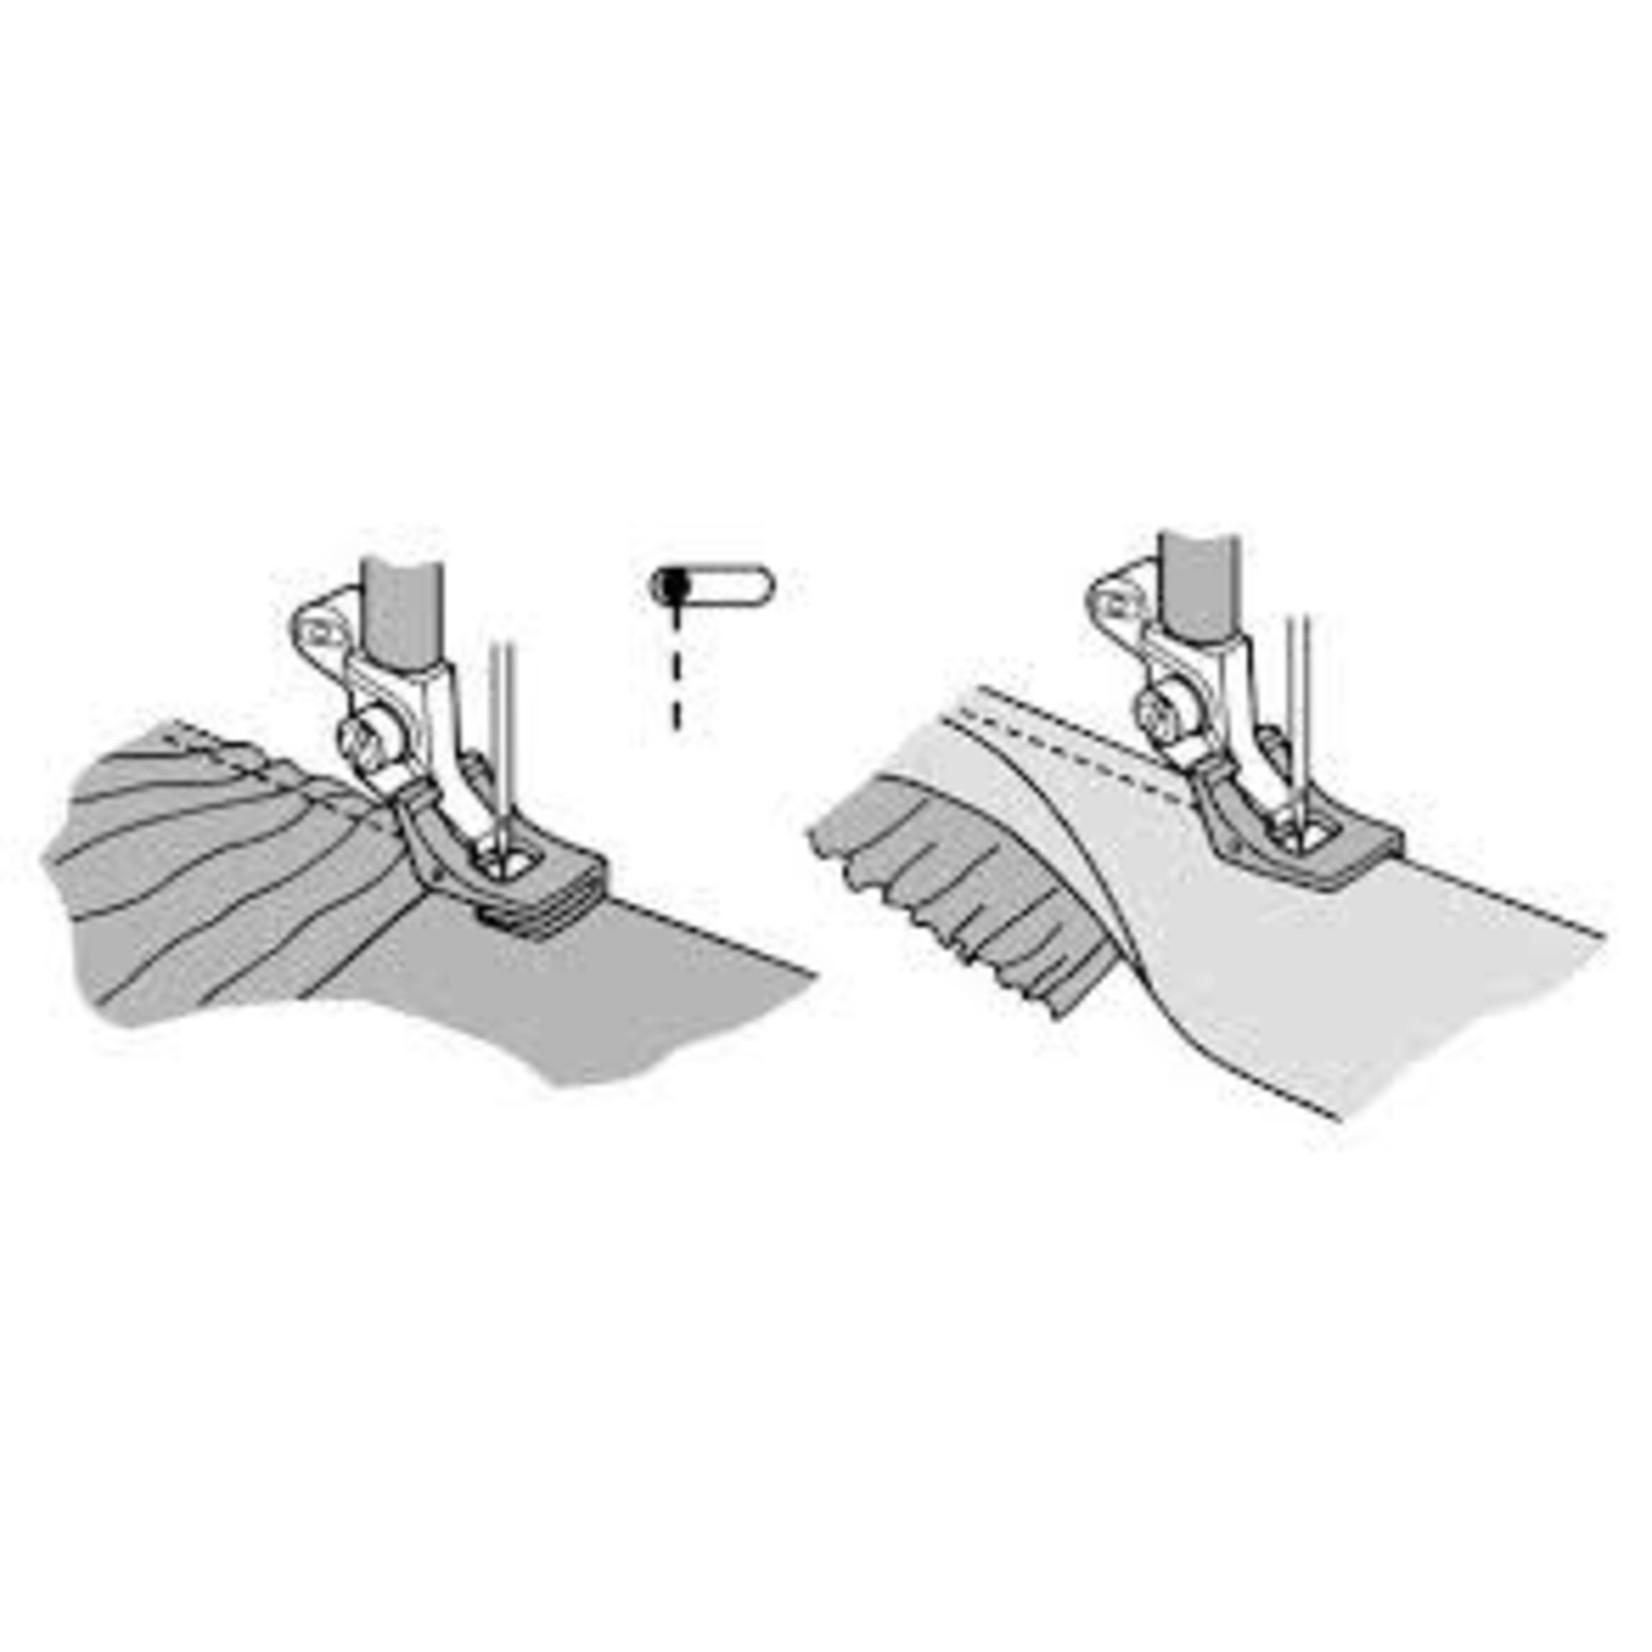 HUSQVARNA VIKING GATHERING FOOT HV BLISTER GRP 1-8